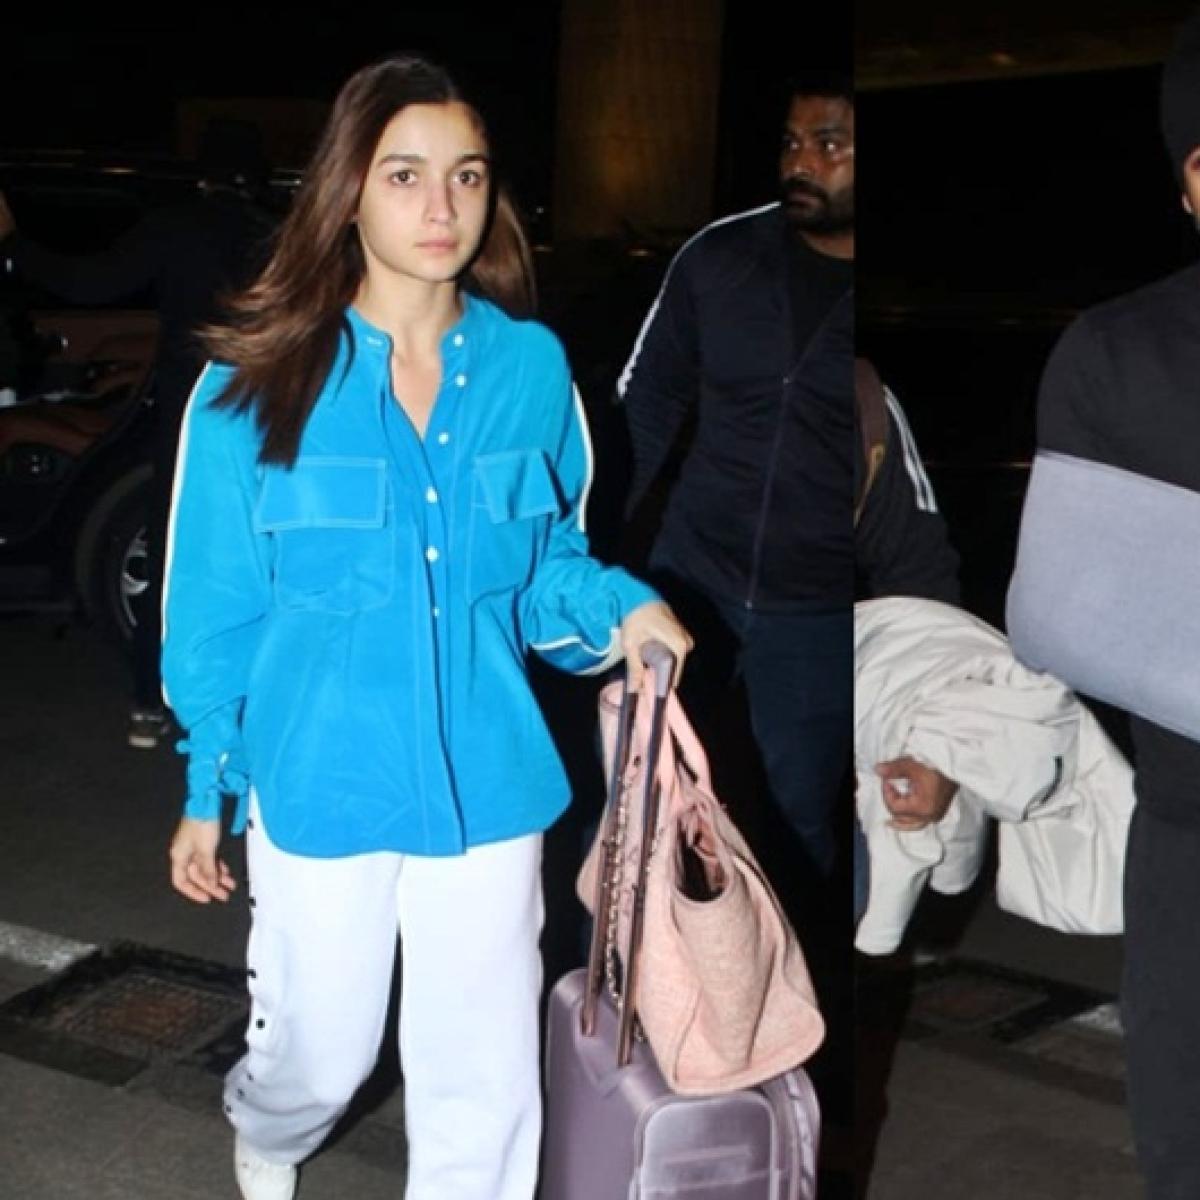 Alia Bhatt's got no chill as she walks ahead of an injured Ranbir Kapoor at the airport